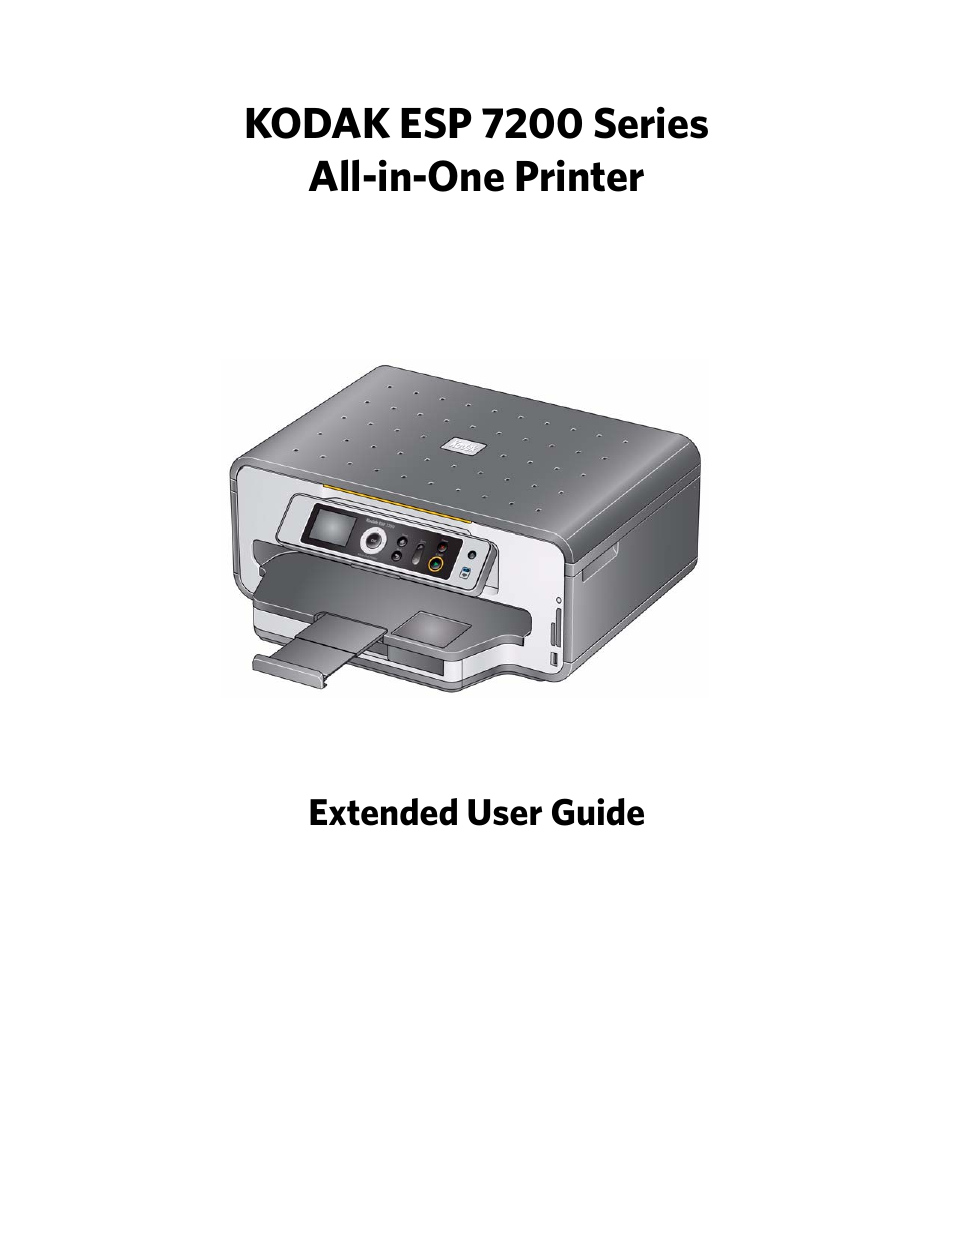 kodak esp 7250 user manual 95 pages rh manualsdir com kodak esp 7250 software download kodak esp 7250 printer manual